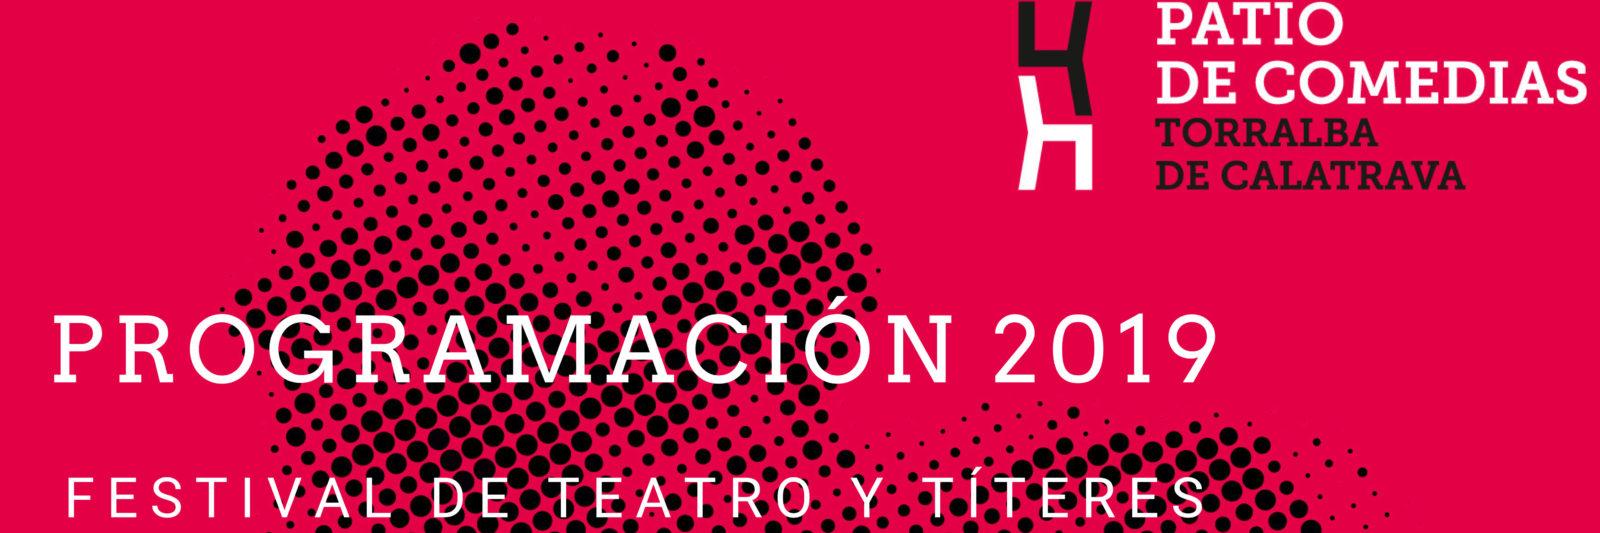 Festival de Teatro Patio de Comedias de Torralba de Calatrava